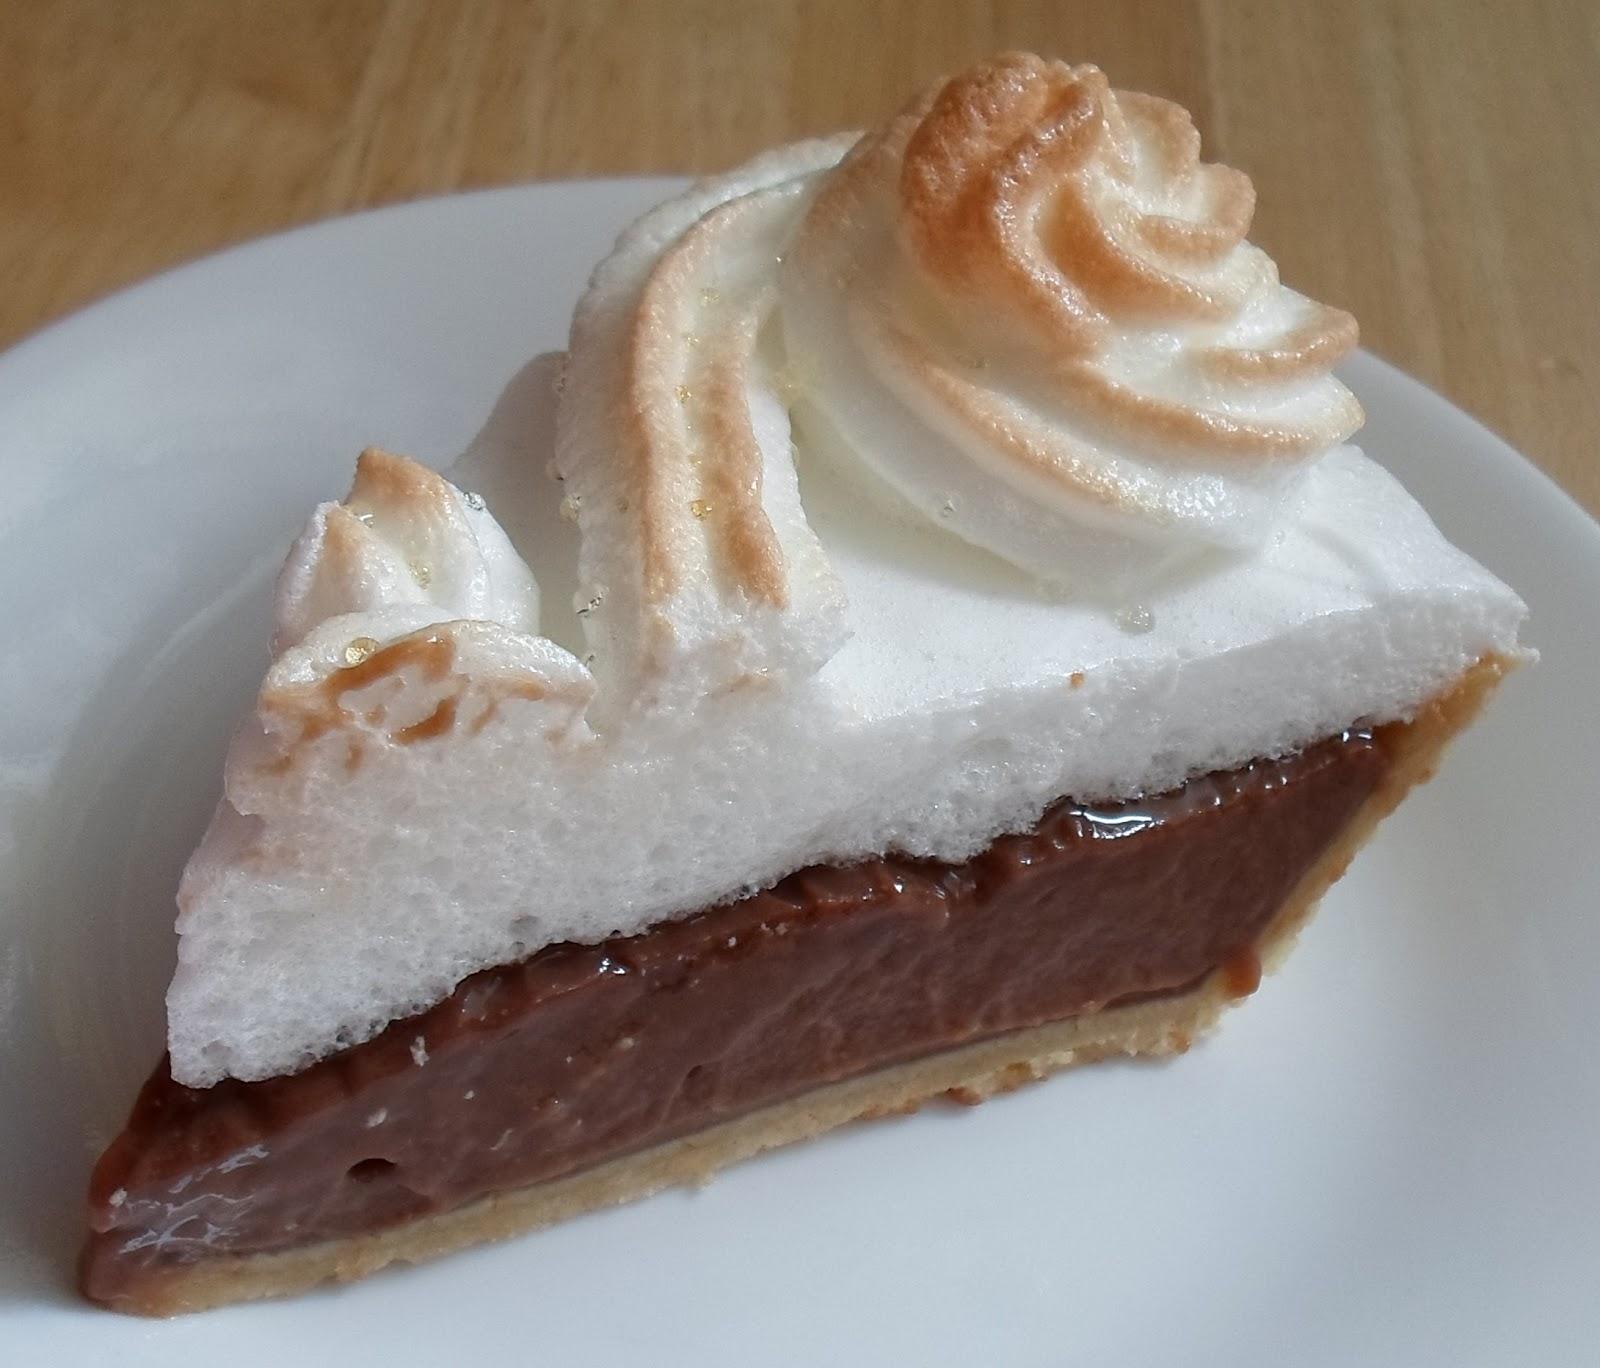 Happier Than A Pig In Mud: Chocolate Cream Meringue Pie